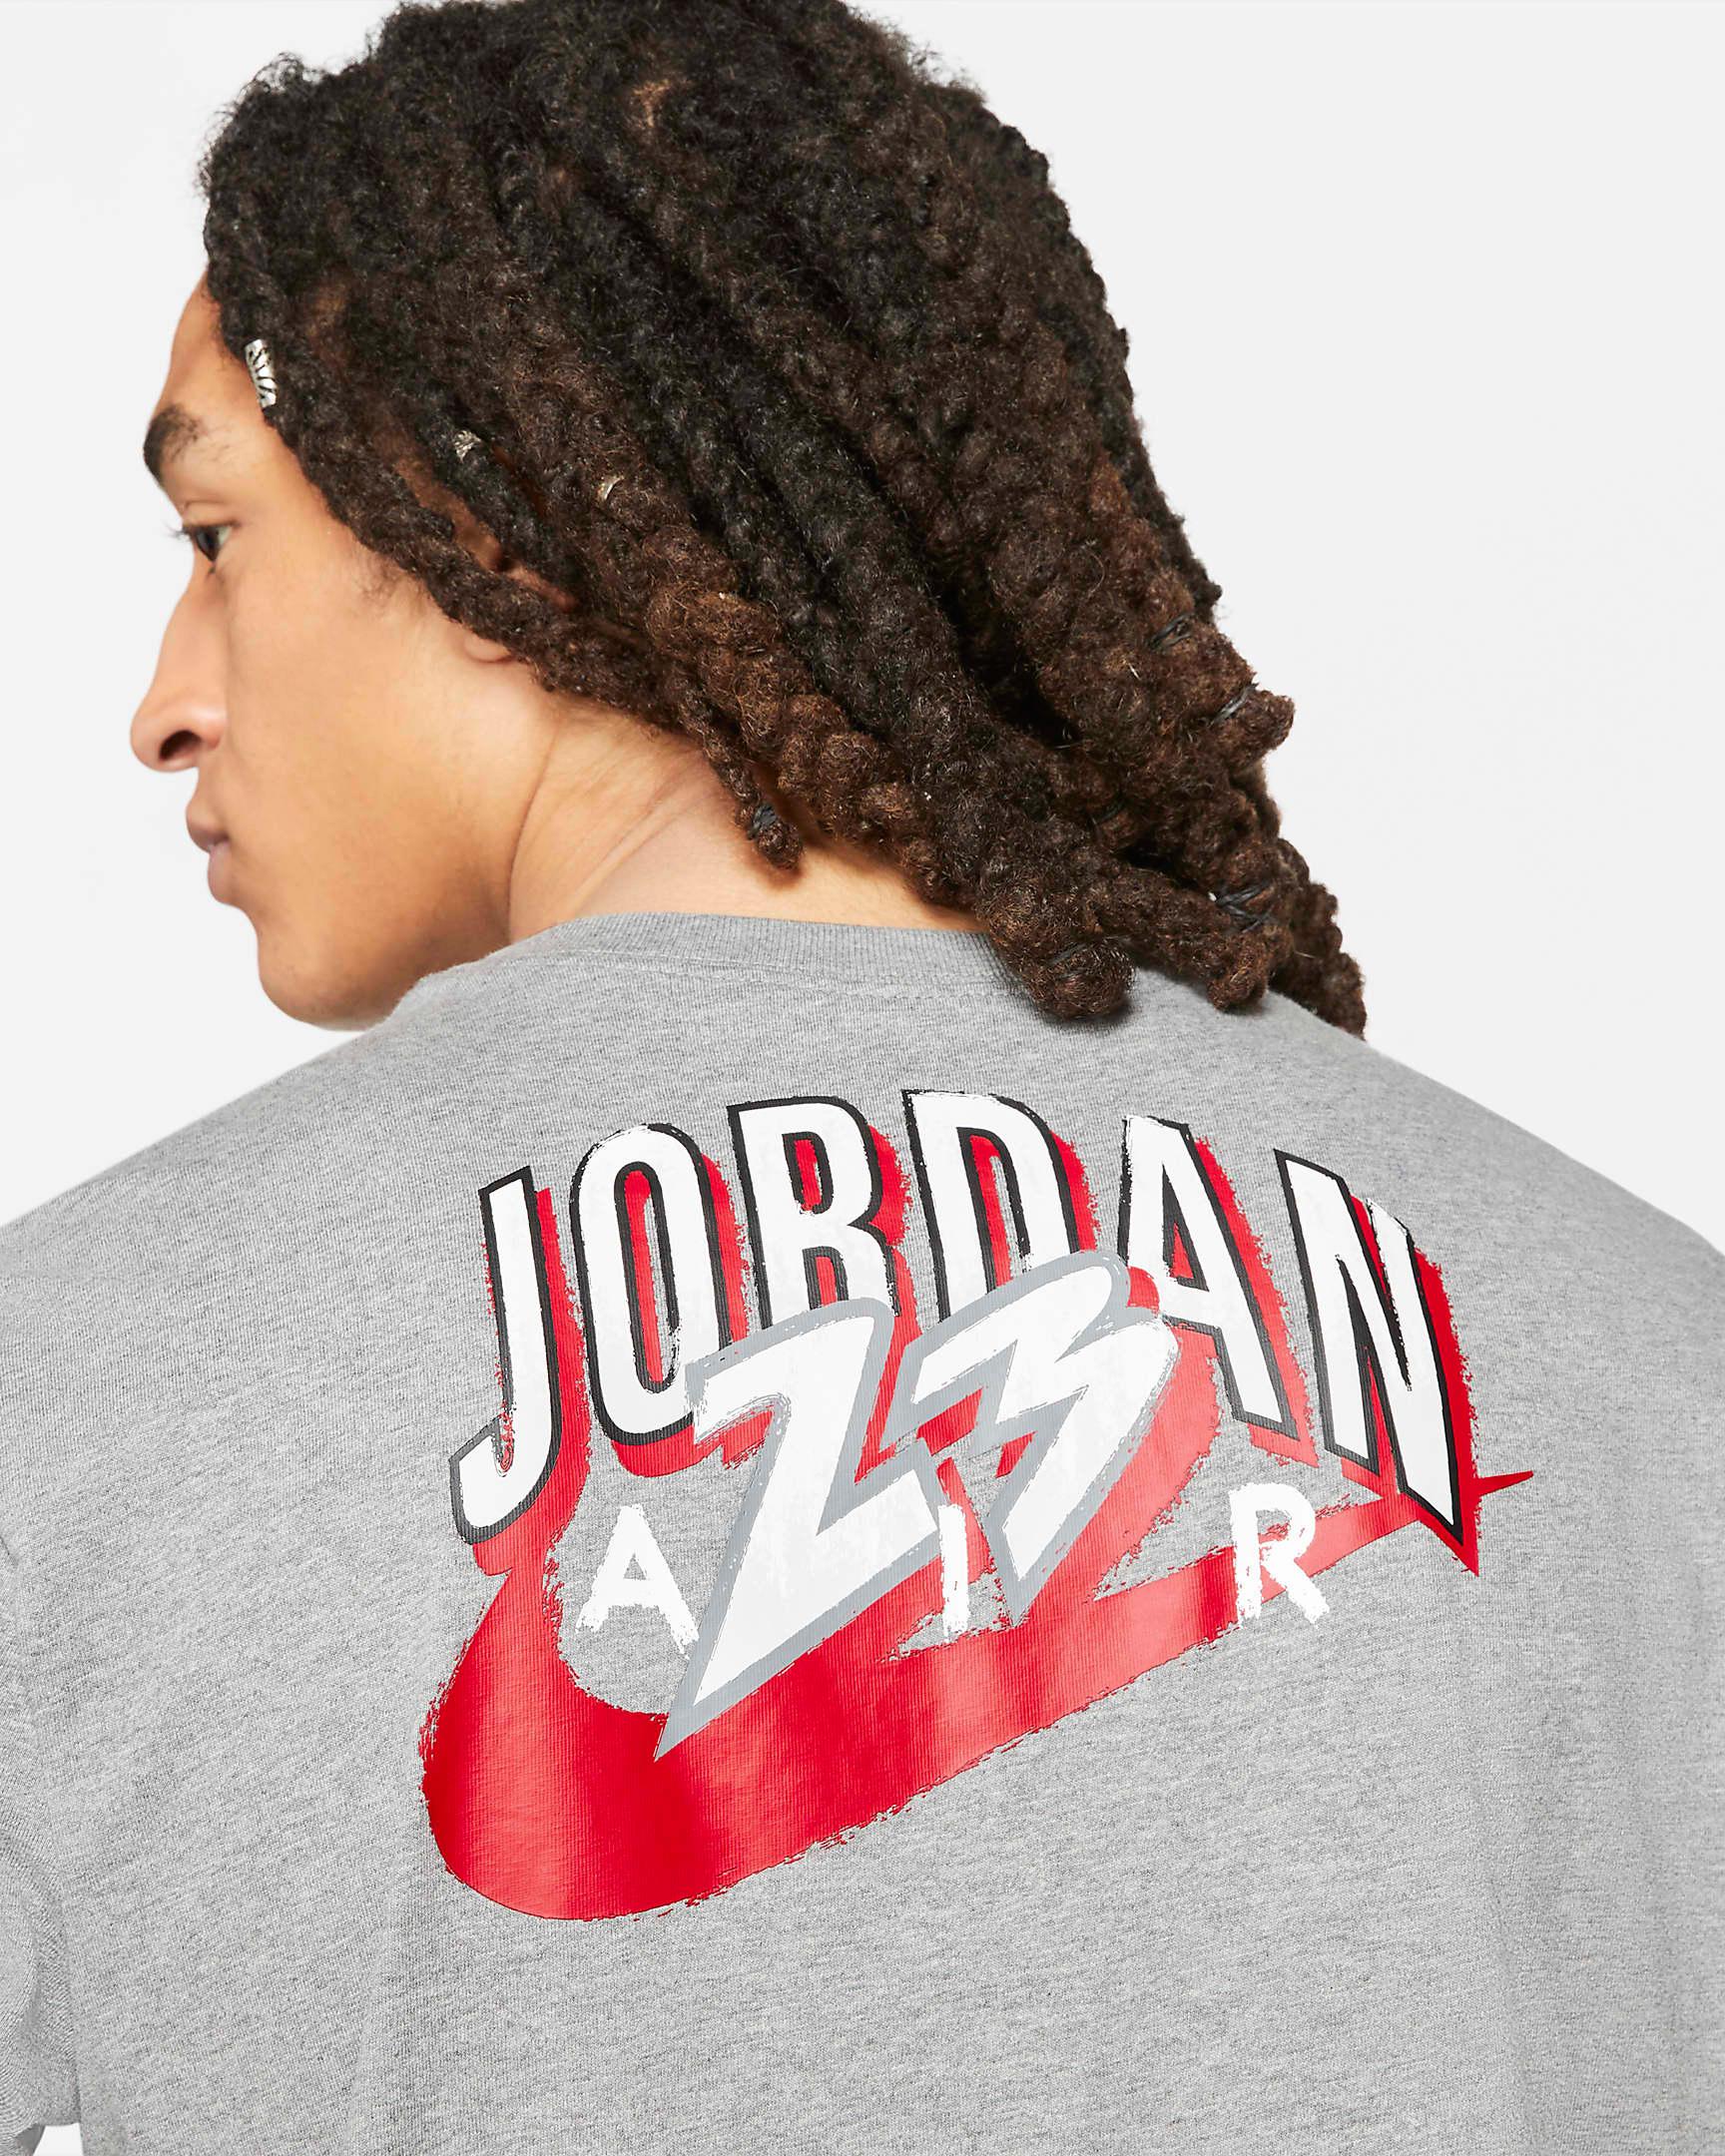 jordan-23-swoosh-t-shirt-grey-red-summer-2021-2